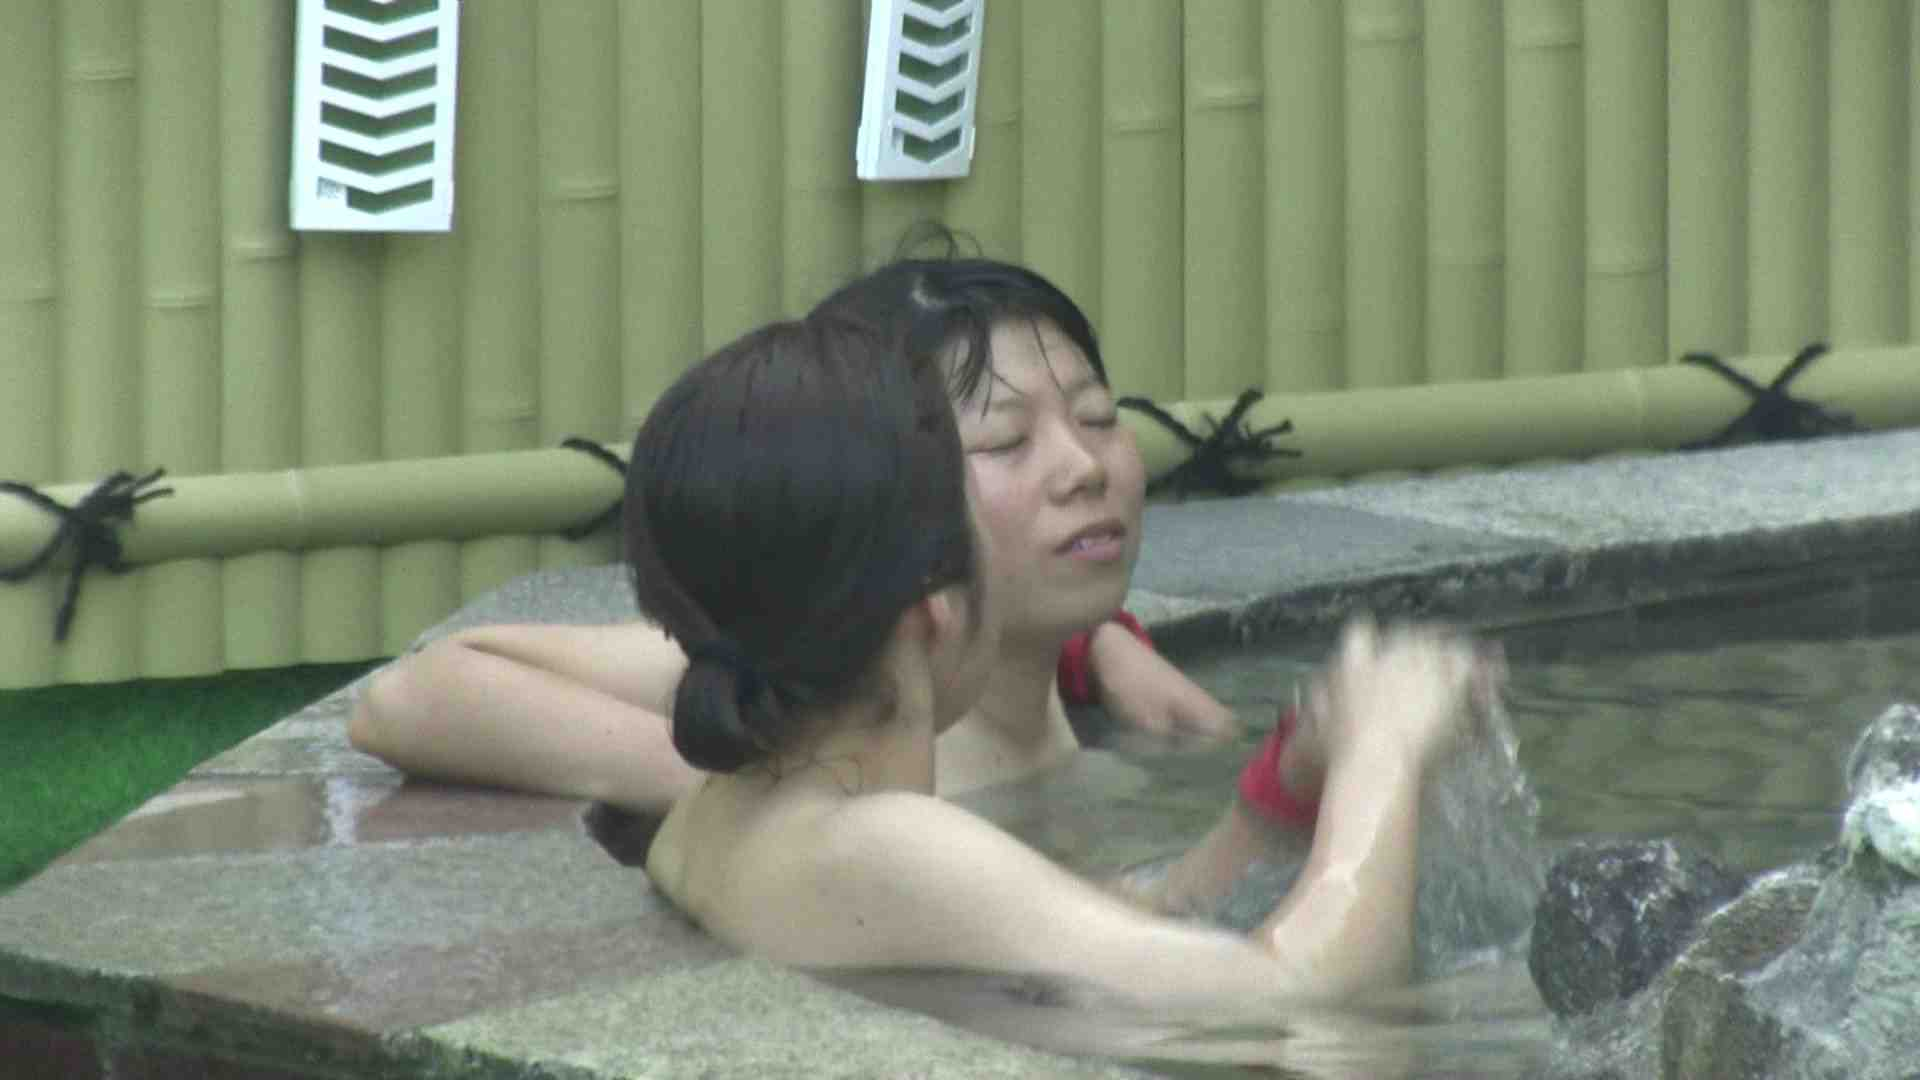 Aquaな露天風呂Vol.182 露天 | OLセックス  80画像 61